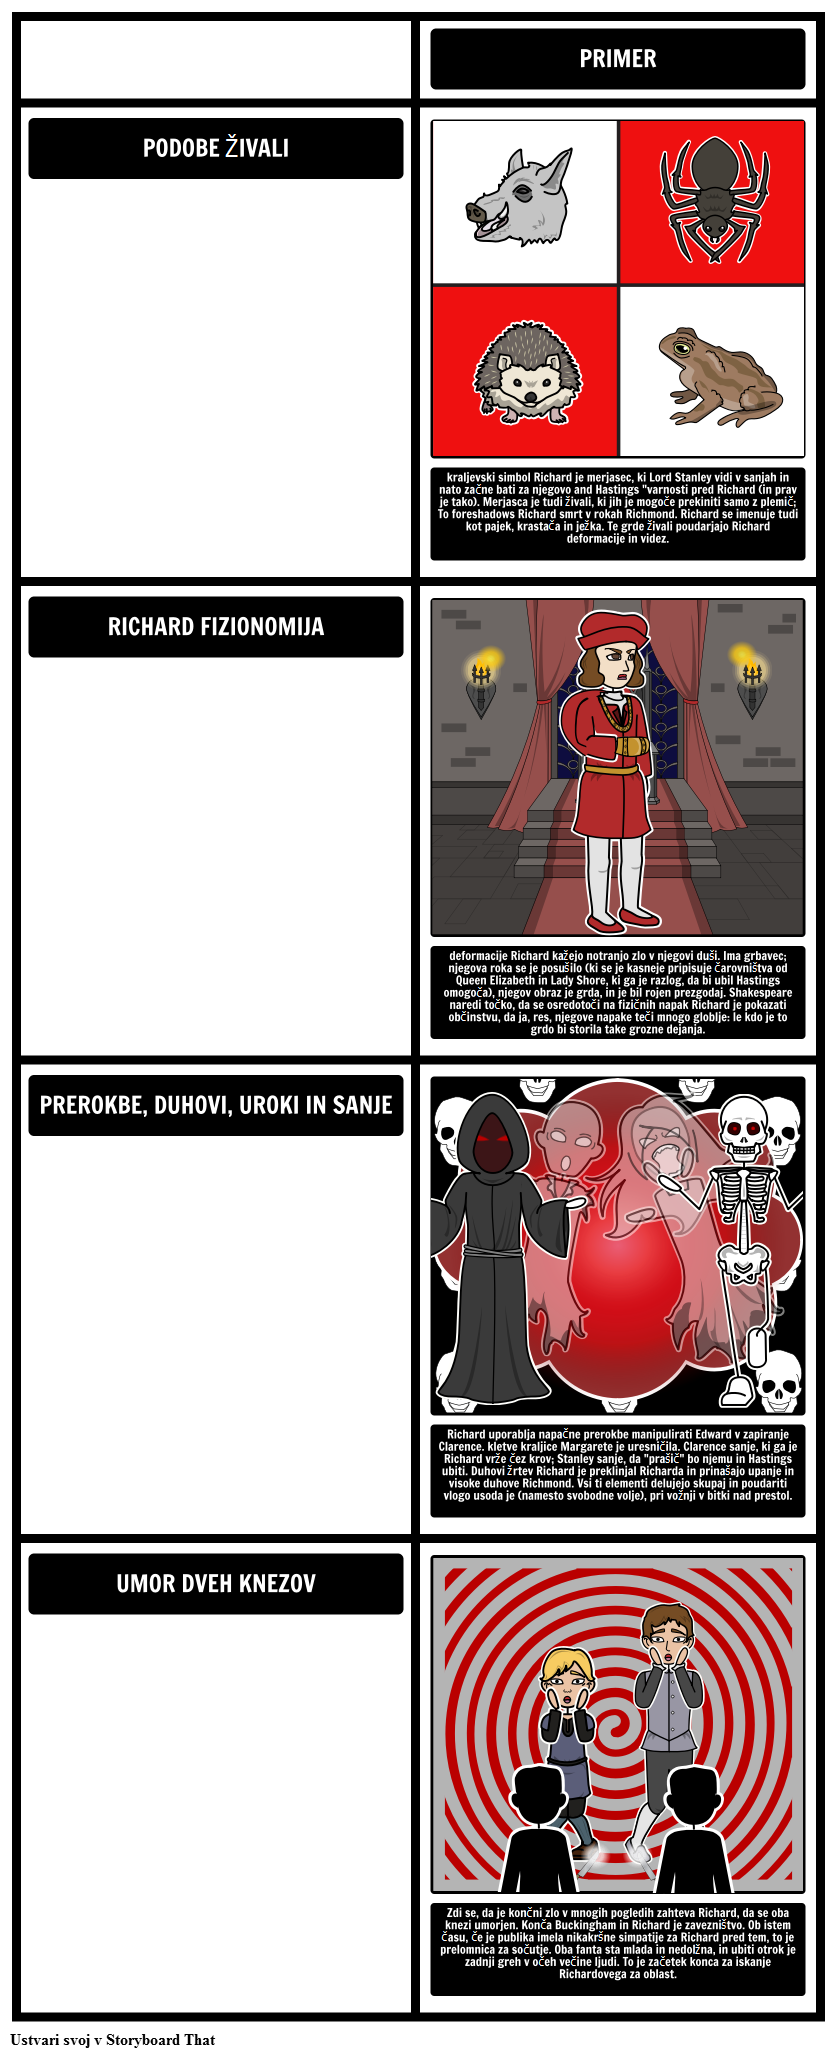 Teme, Motivi in simboli v Tragediji Richard III